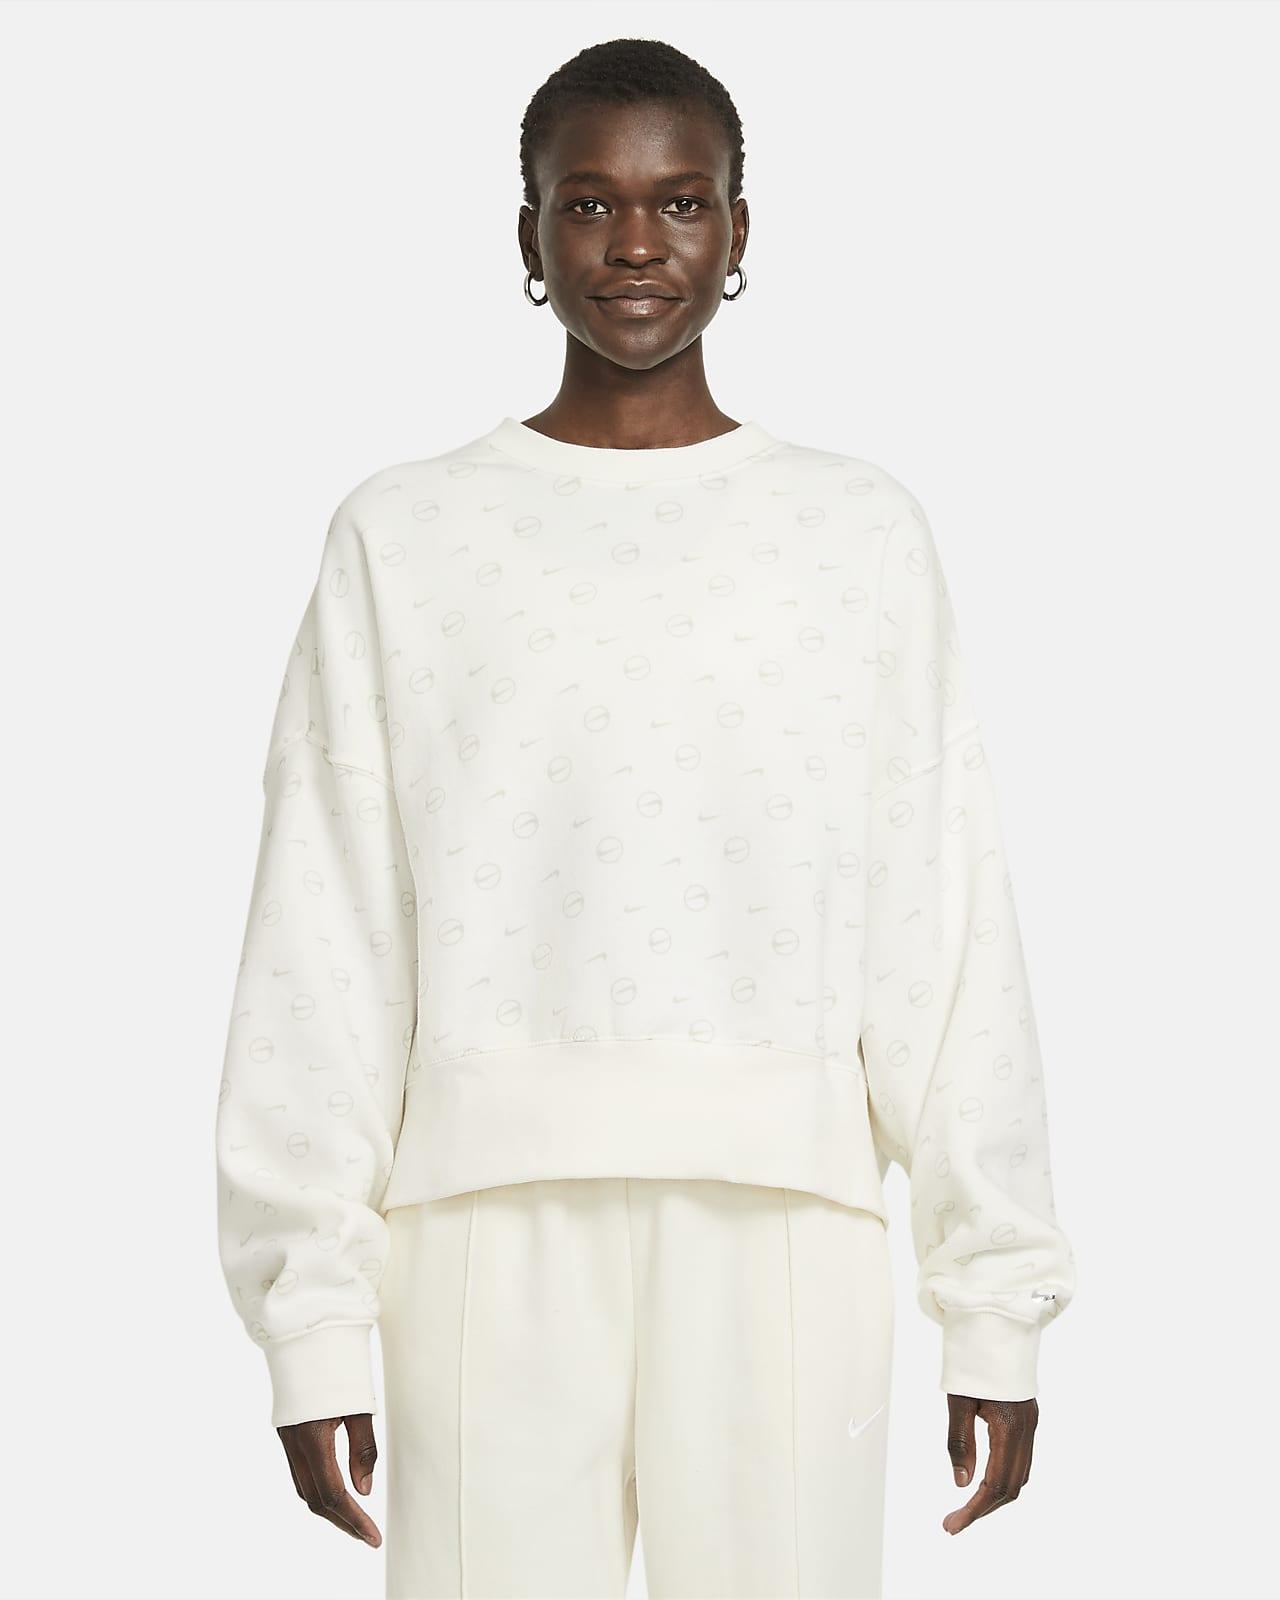 Haut imprimé en tissu Fleece Nike Sportswear pour Femme